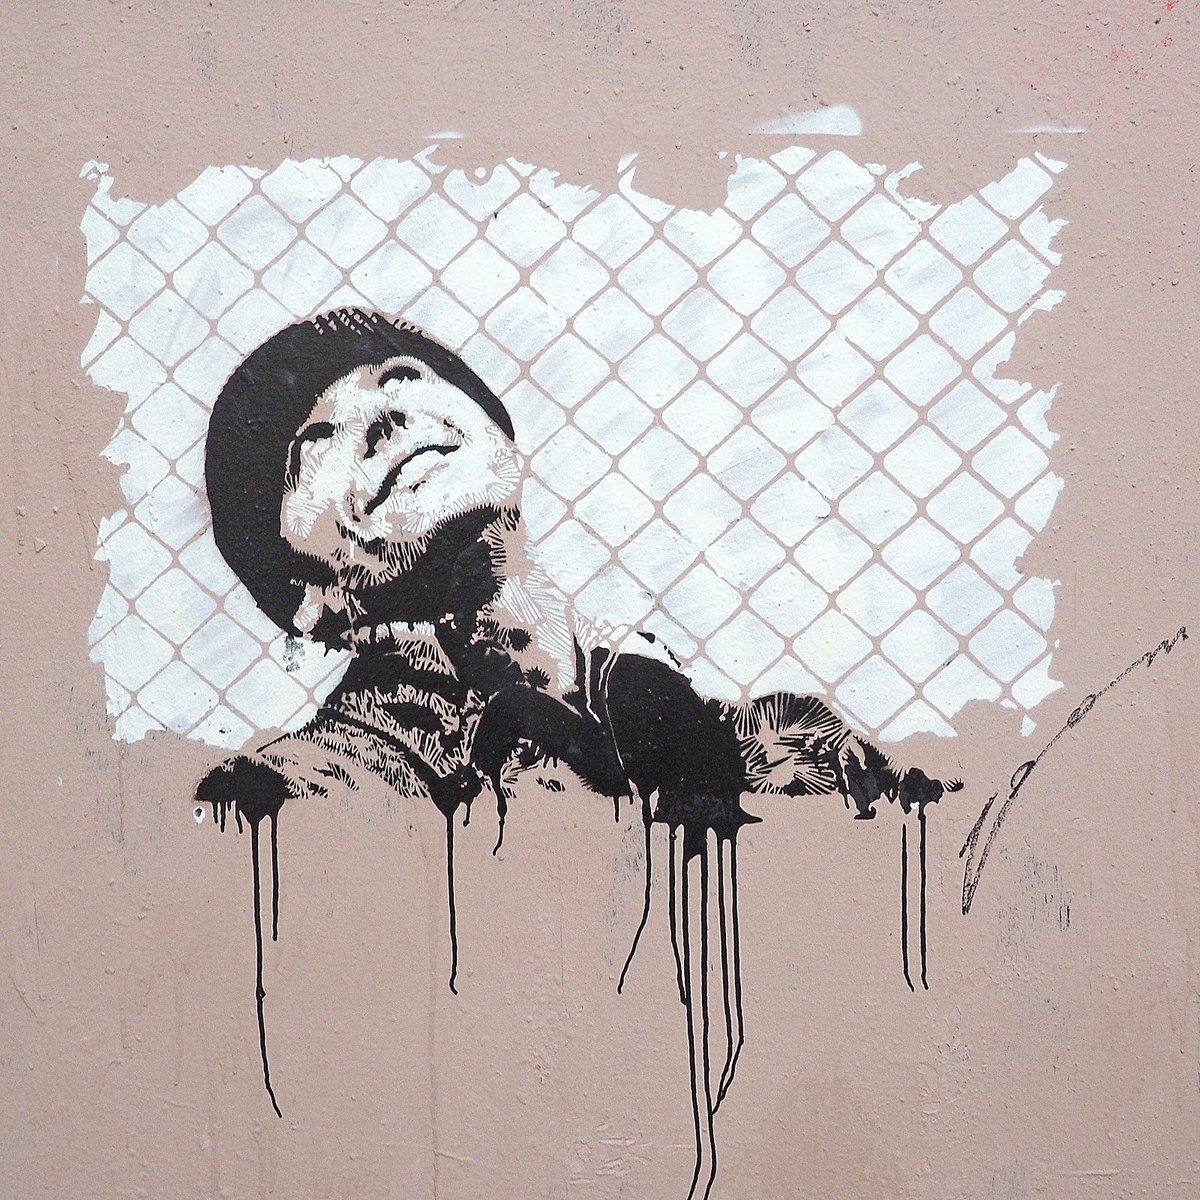 ONE FLEW OVER THE CUCKOO&#39;S NEST (1975) by artist #Zoom in #Moscow #streetartcinema #streetart  #OneFlewOverTheCuckoosNest #Film #cinema<br>http://pic.twitter.com/gb5Mo3mzto